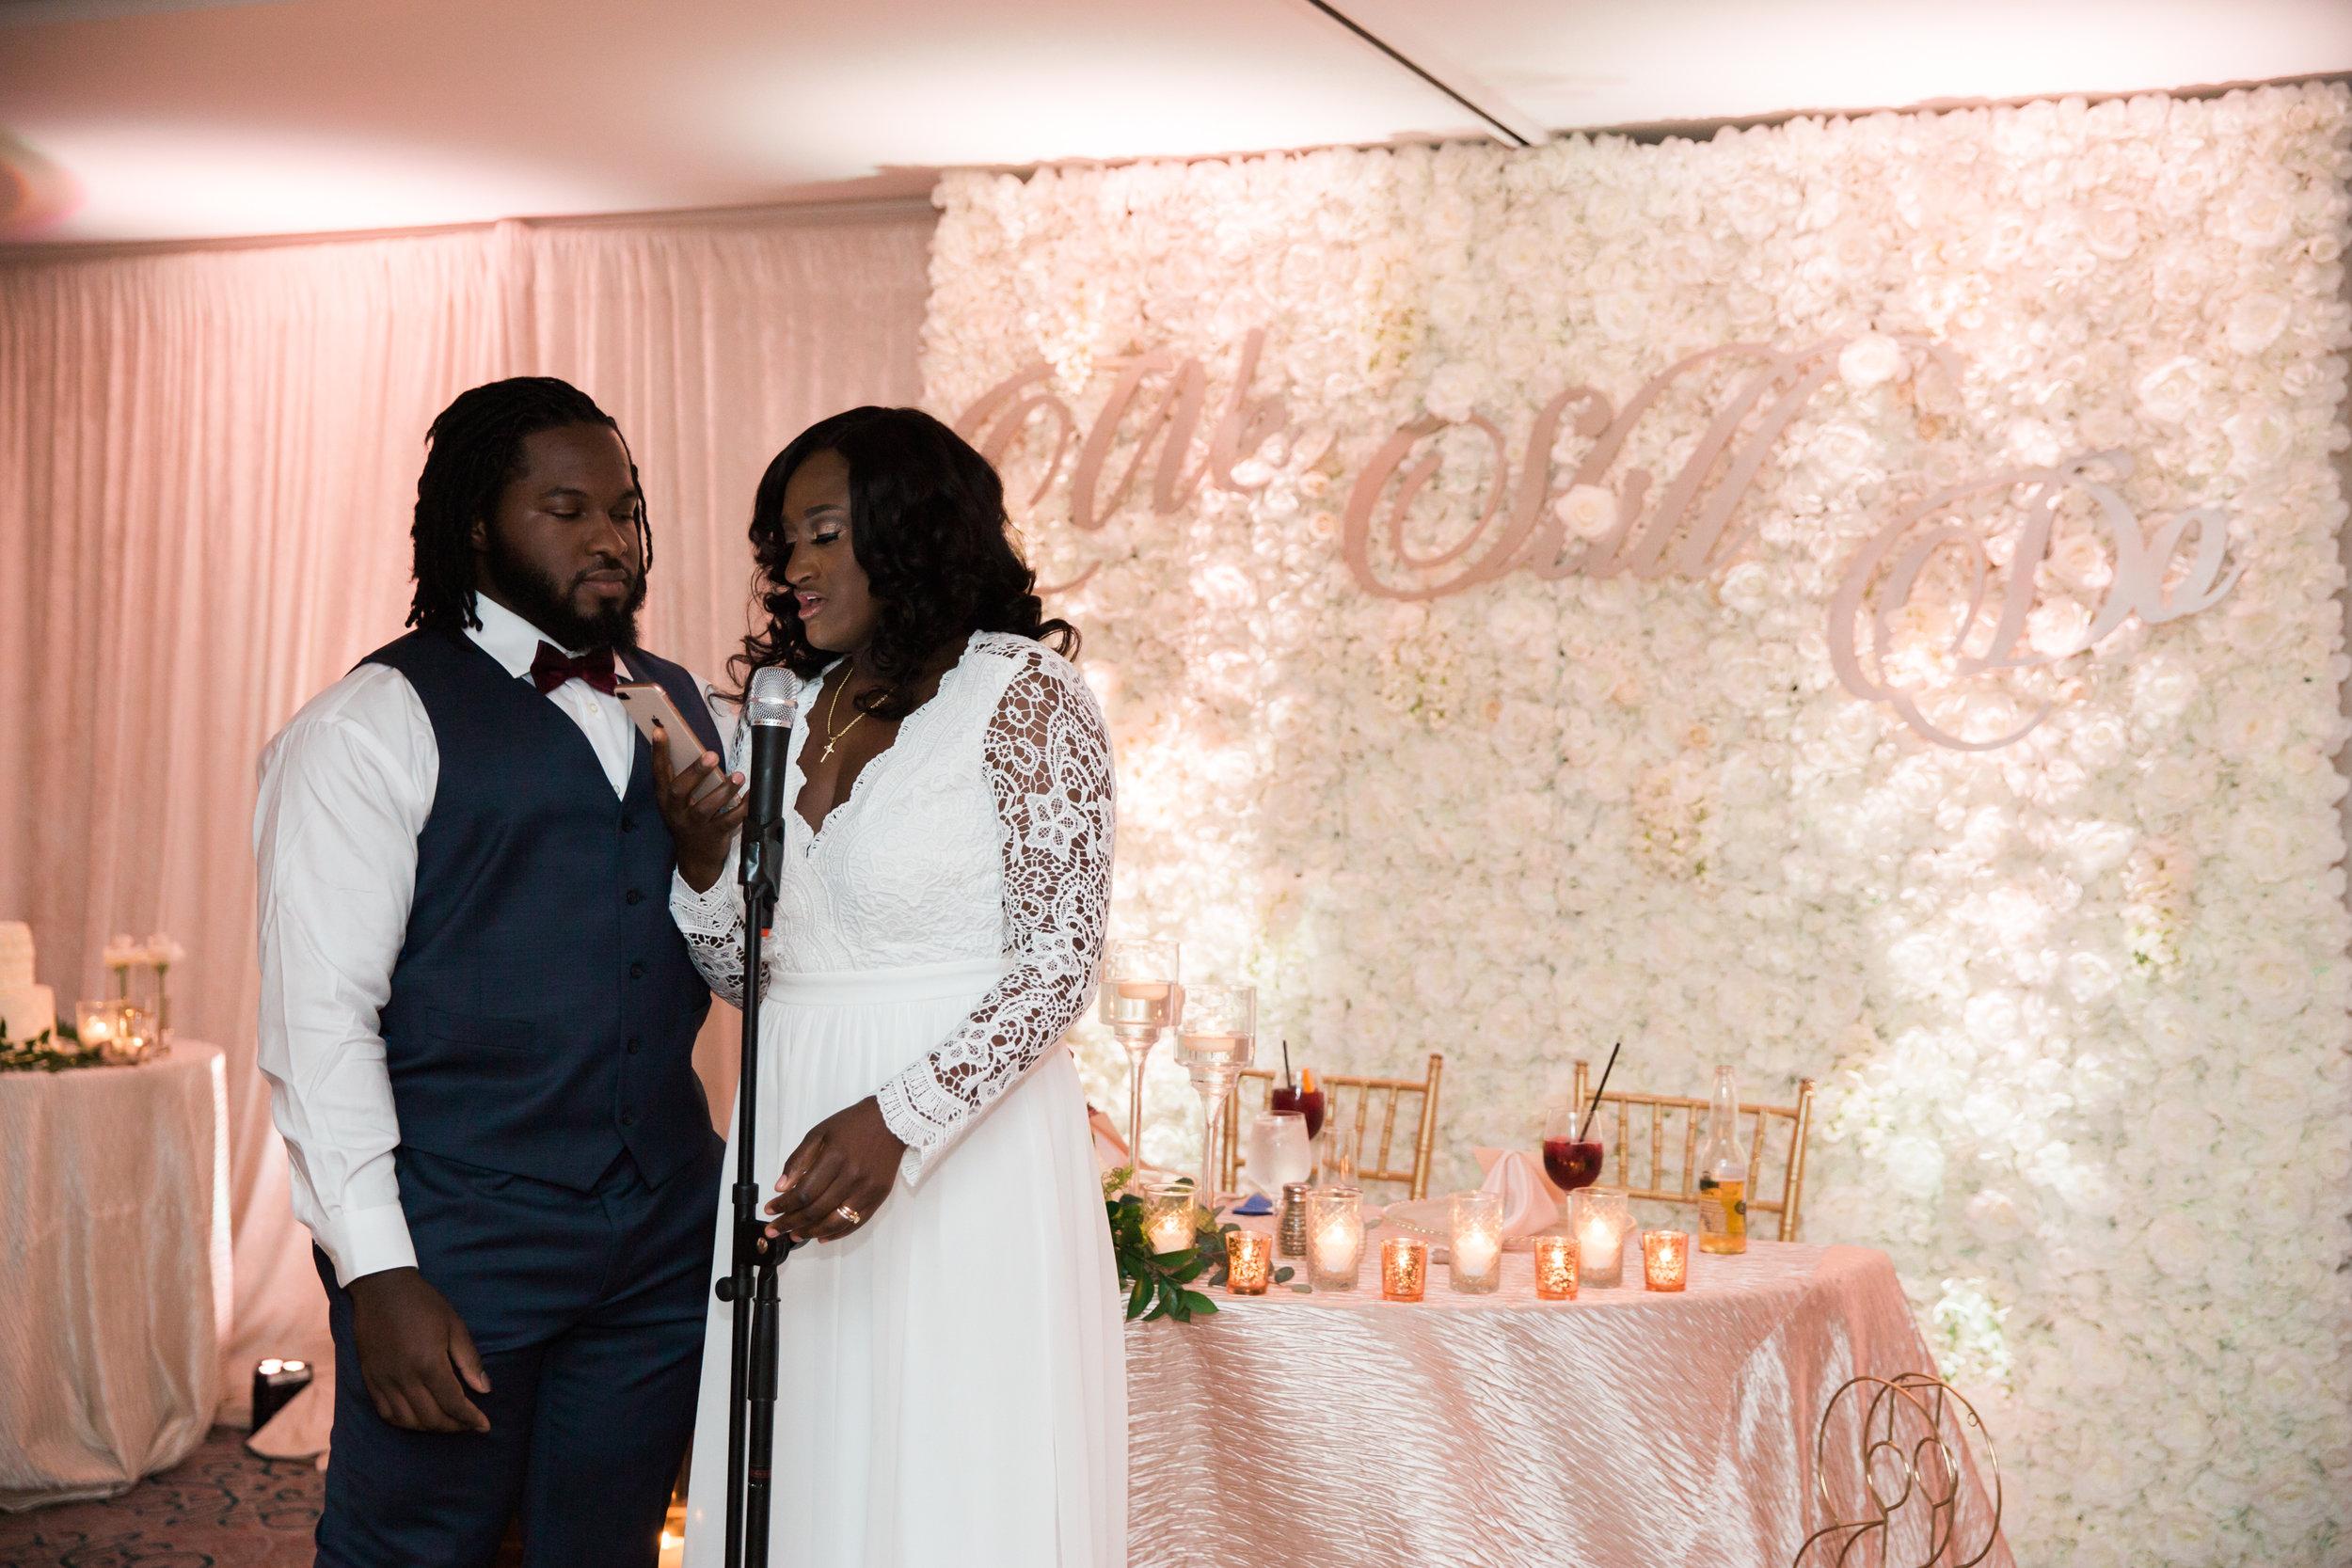 Baltimore City Wedding at Hotel Indigo Megapixels Media Photography Tira Lynn Events Black Bride and Groom (49 of 74).jpg